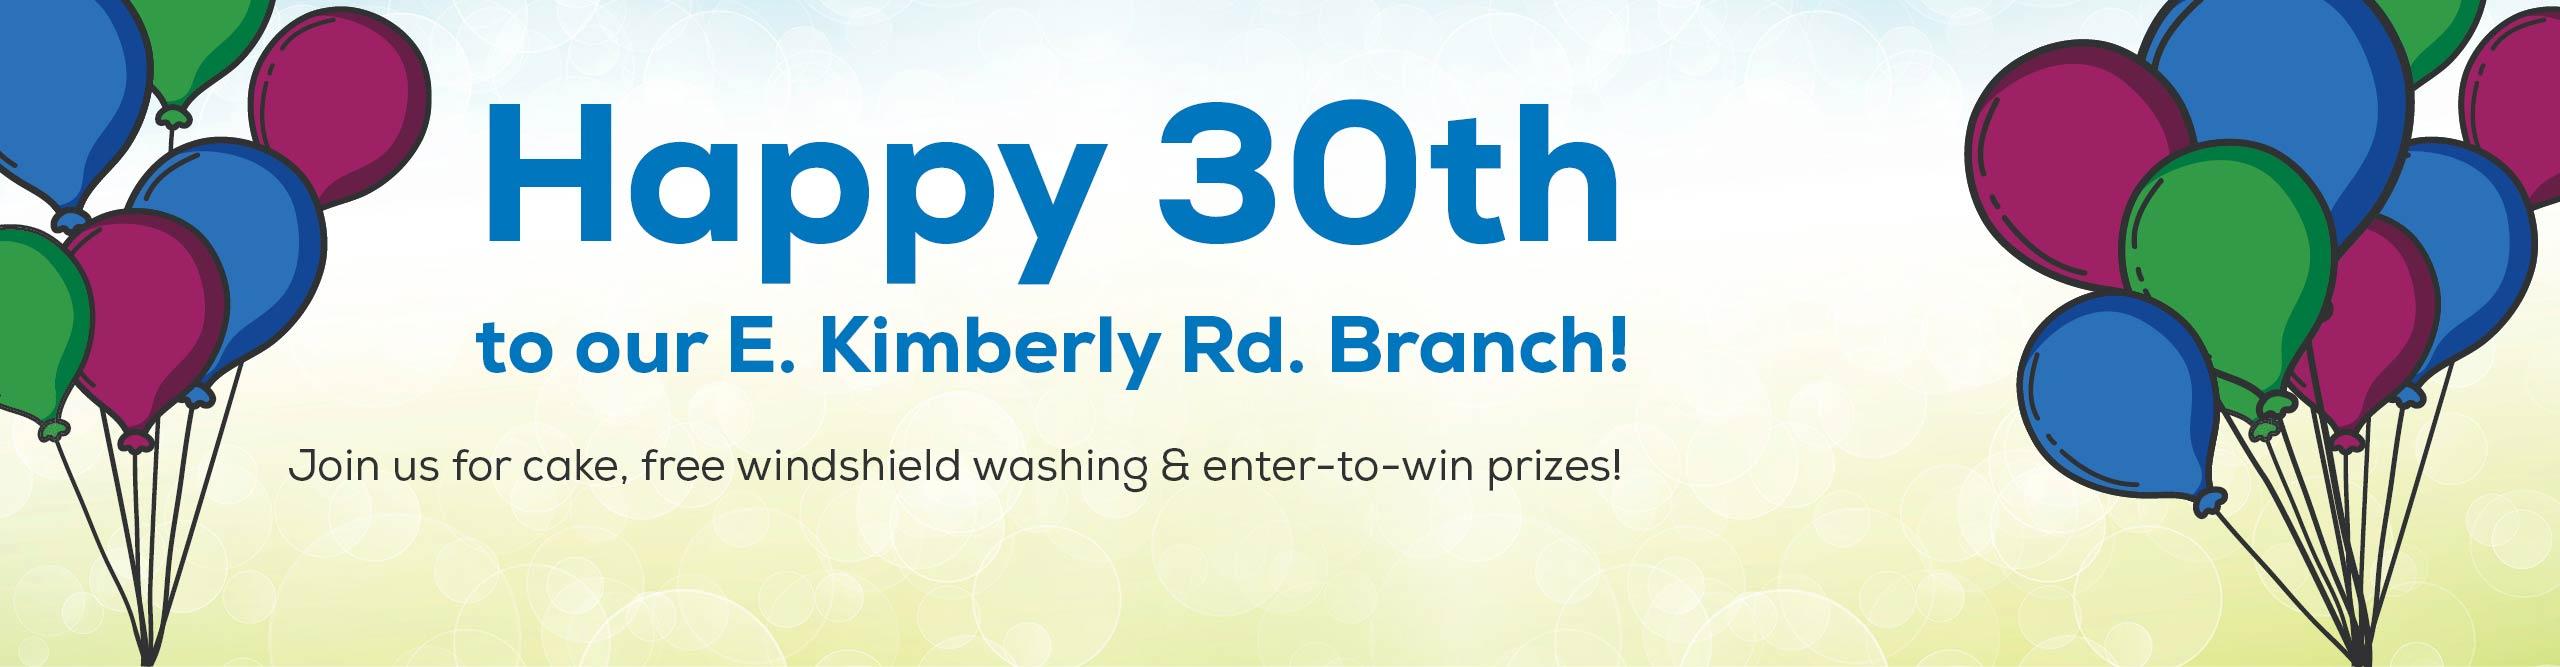 East Kimberly Road 30th Anniversary Celebration